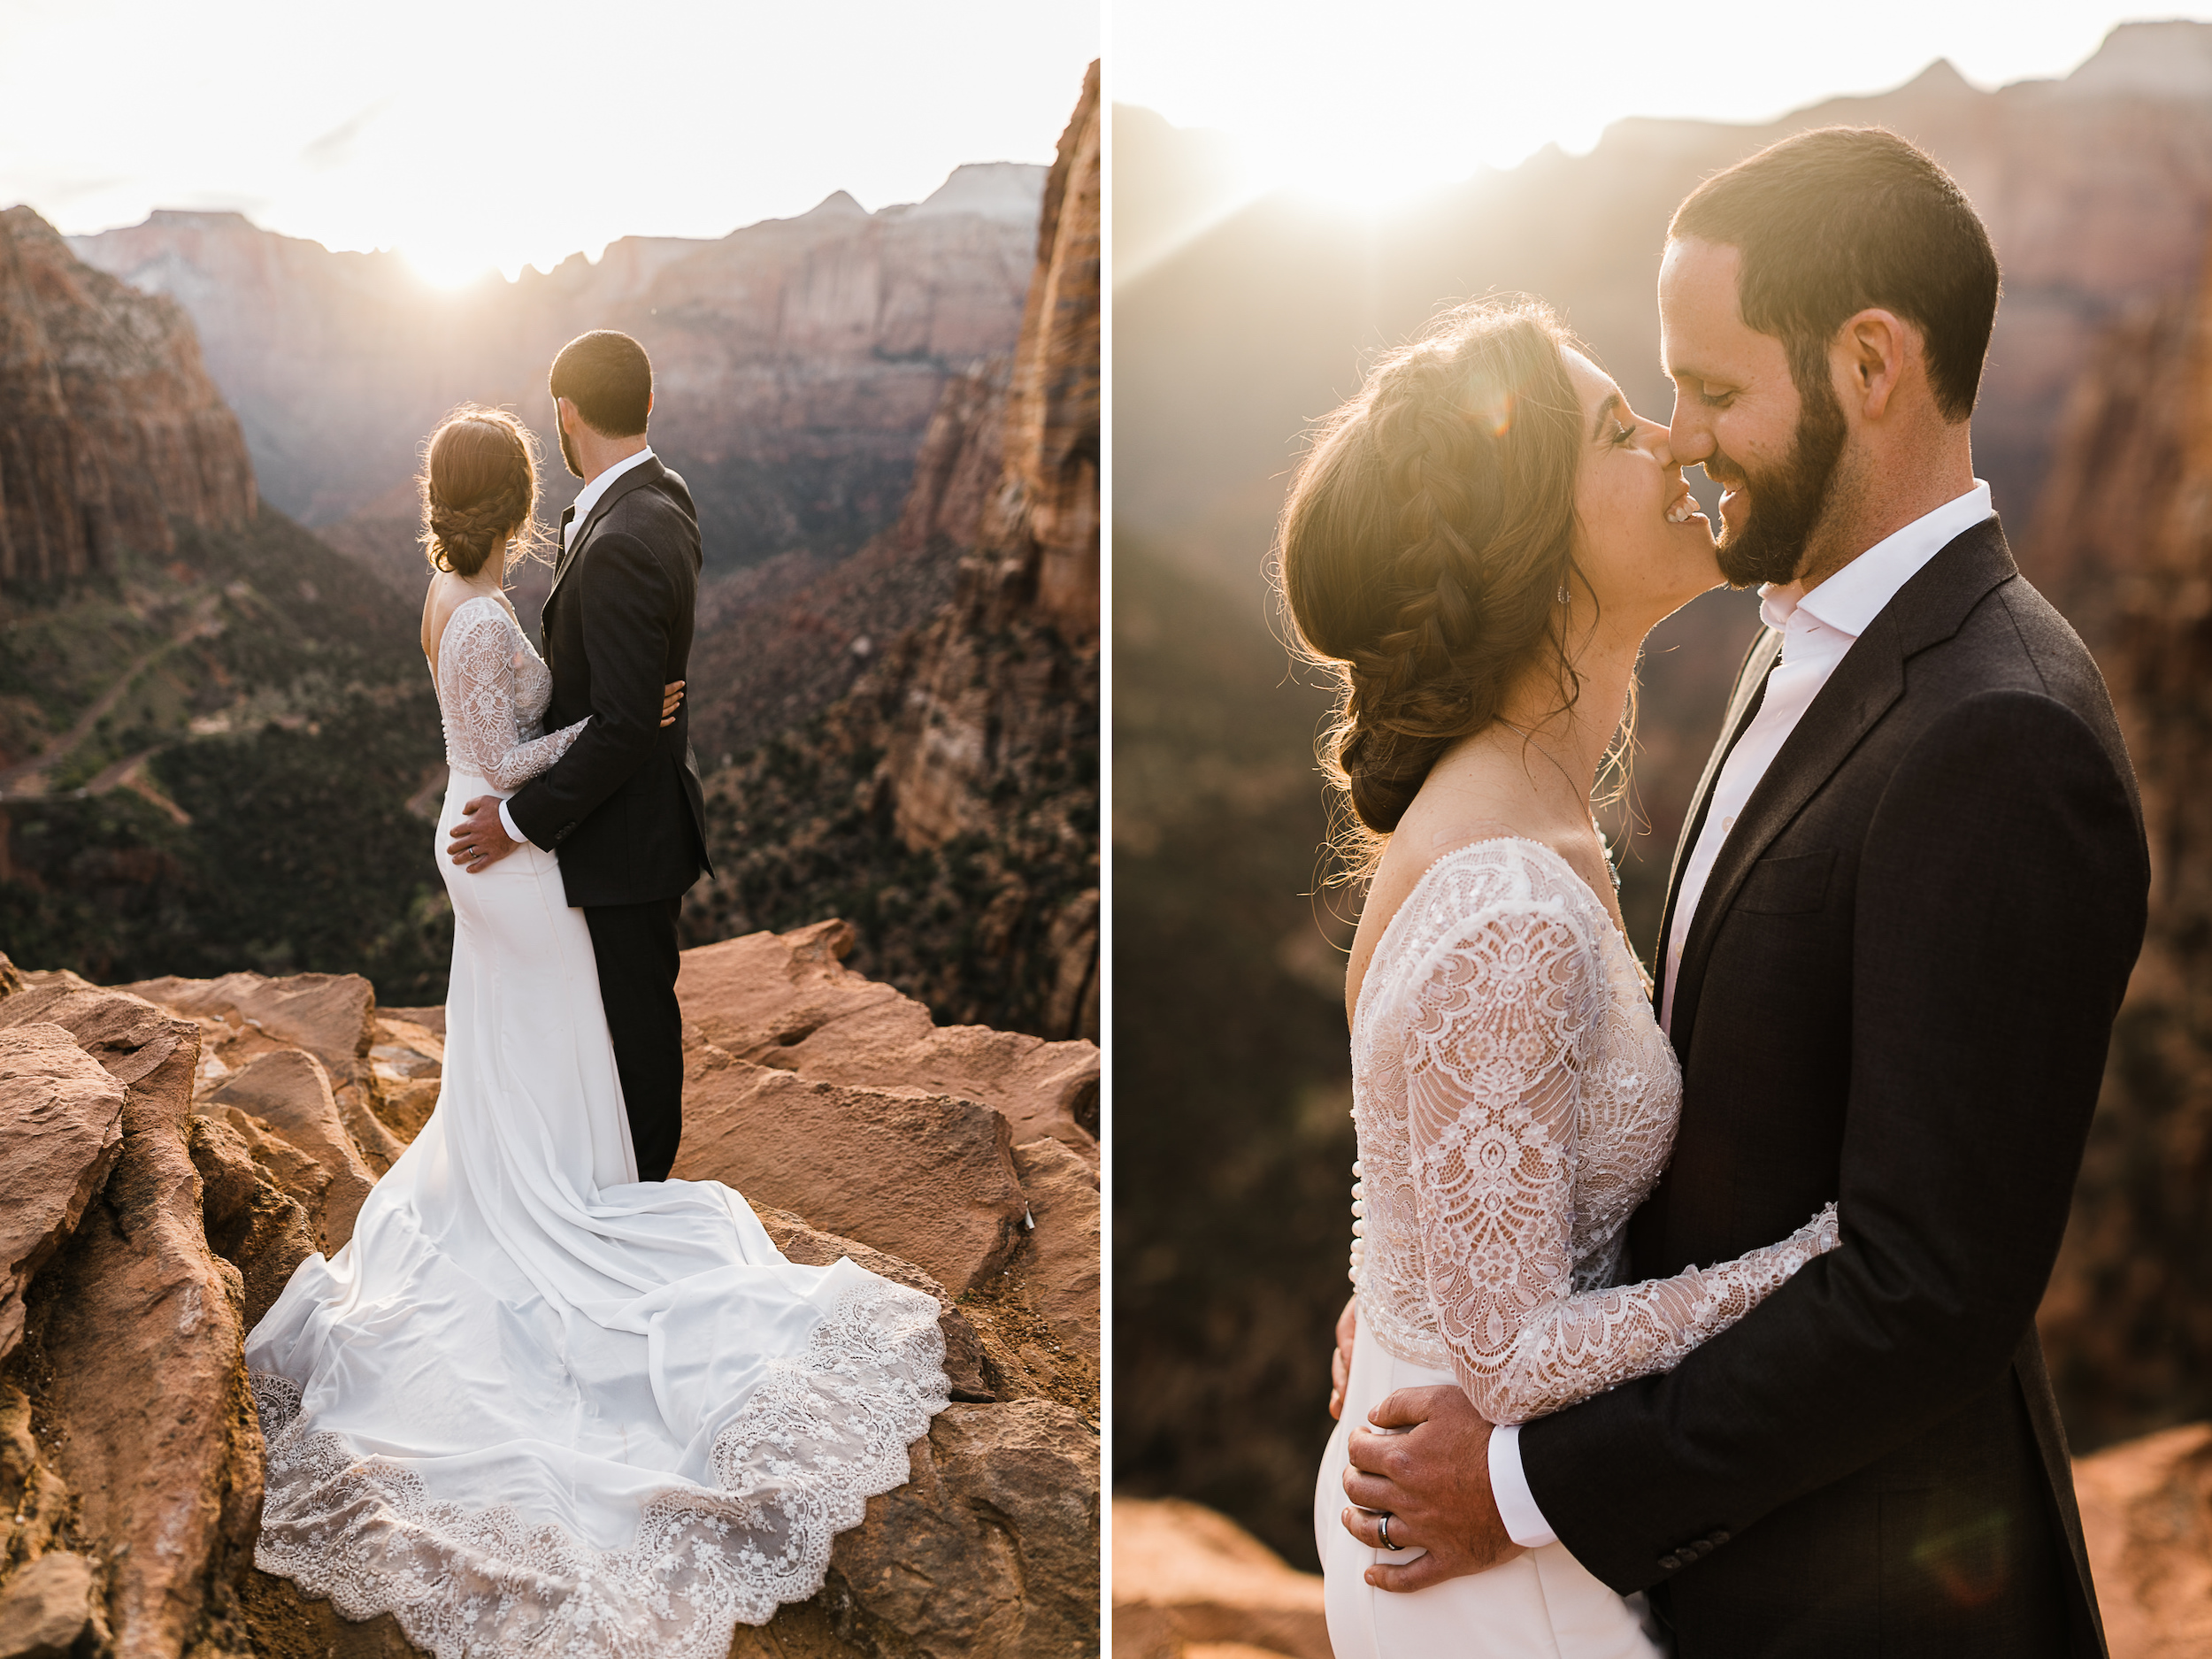 Zion-National-Park-Adventure-Wedding-Hearnes-Elopement-Photography-48.jpg